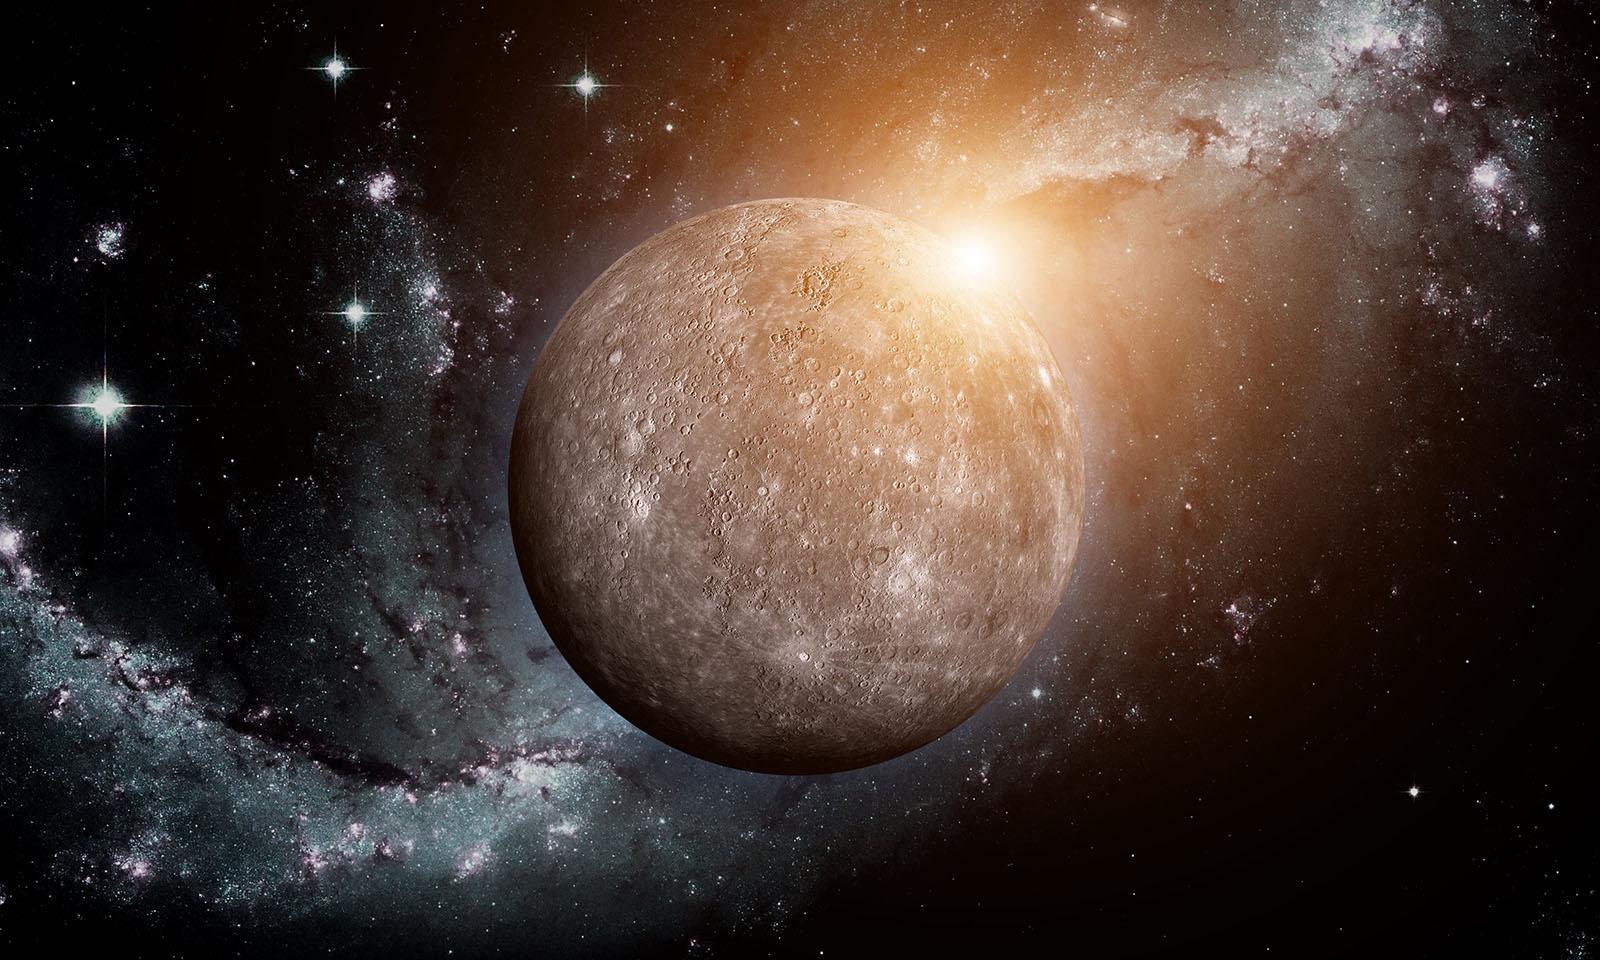 Mercury Retrograde Always Negative or Not?